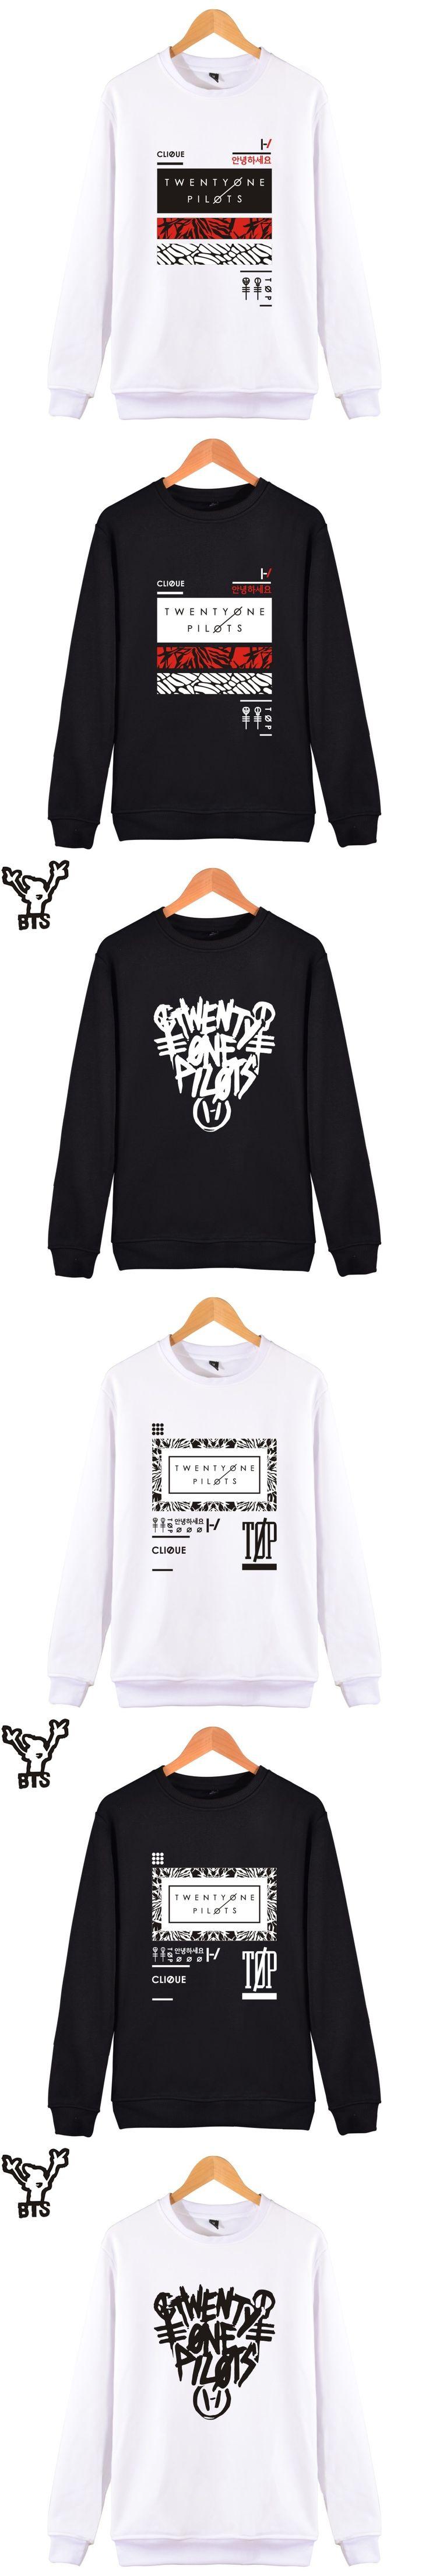 BTS Twenty One Pilots Sweatshirt Men Hoodie 2017 Popular Rock Band Hoodies Hip Hop USA Fashion Casual Fans Streetwear Clothes